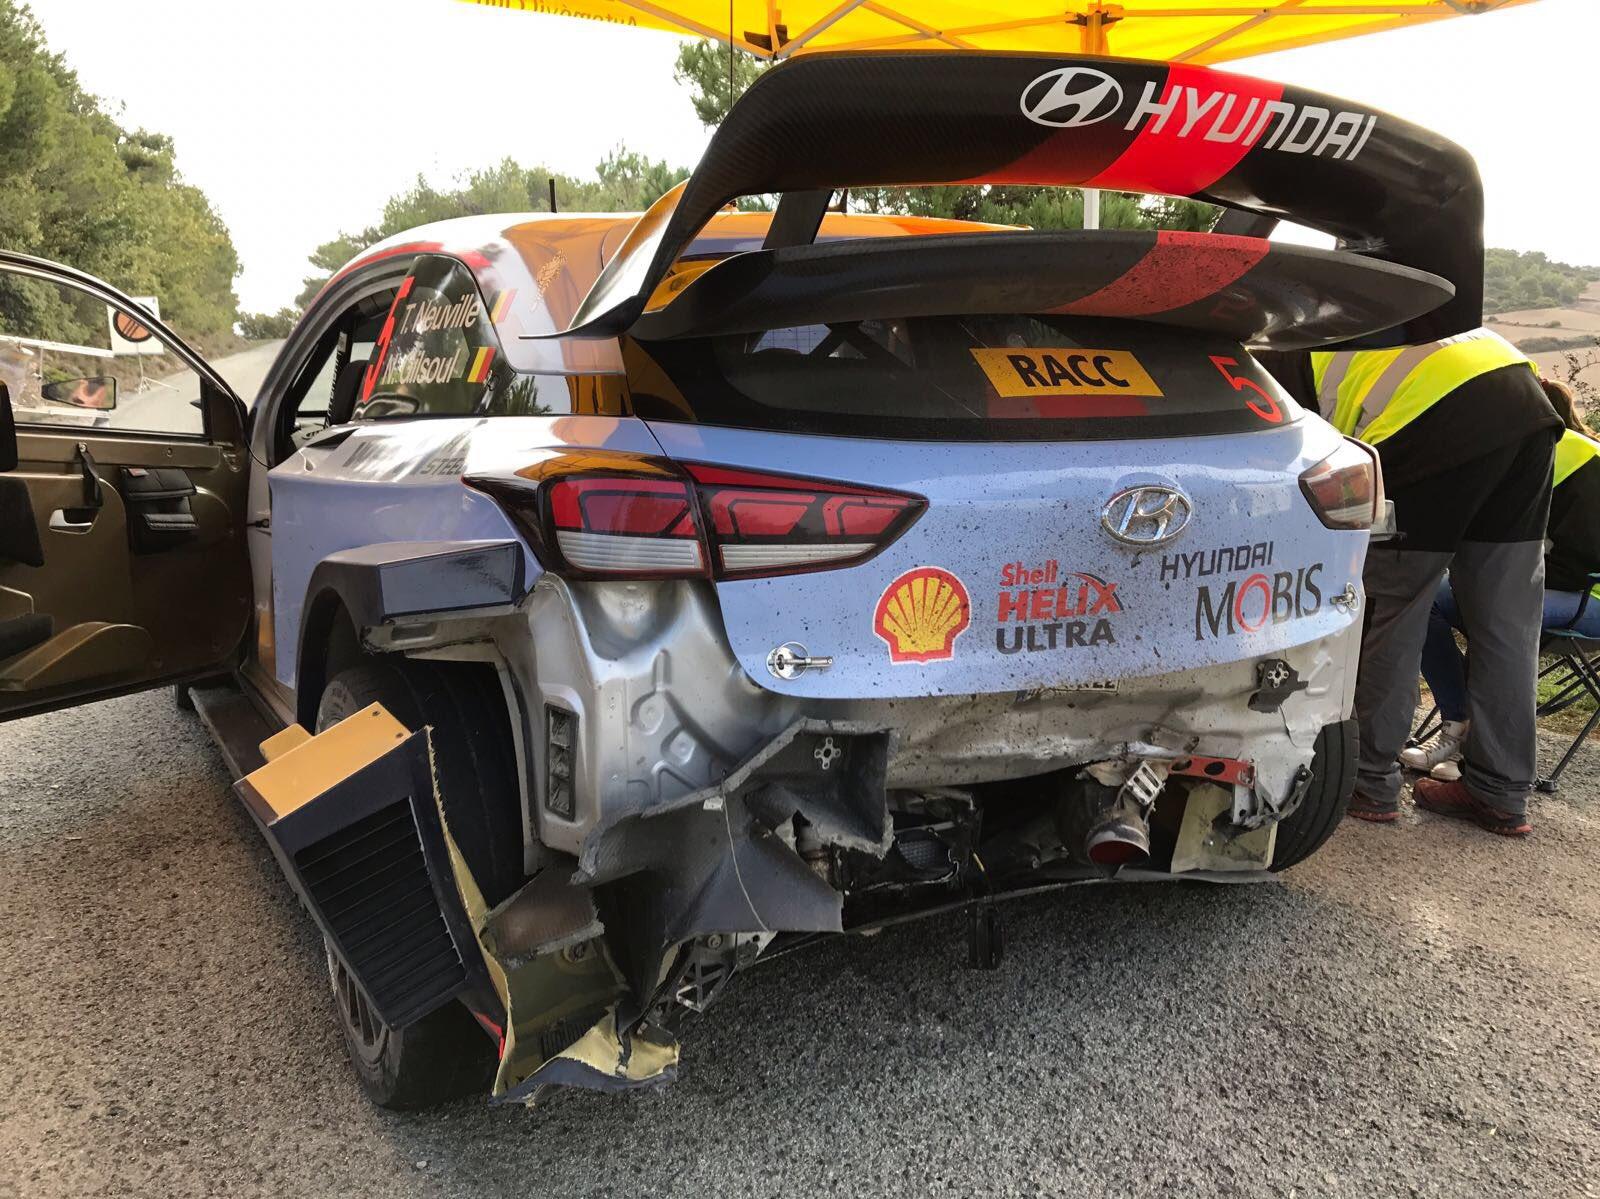 RallyRACC Catalunya - Costa Daurada 2017 - Página 2 36021_dlhdrgcw0aek9gz